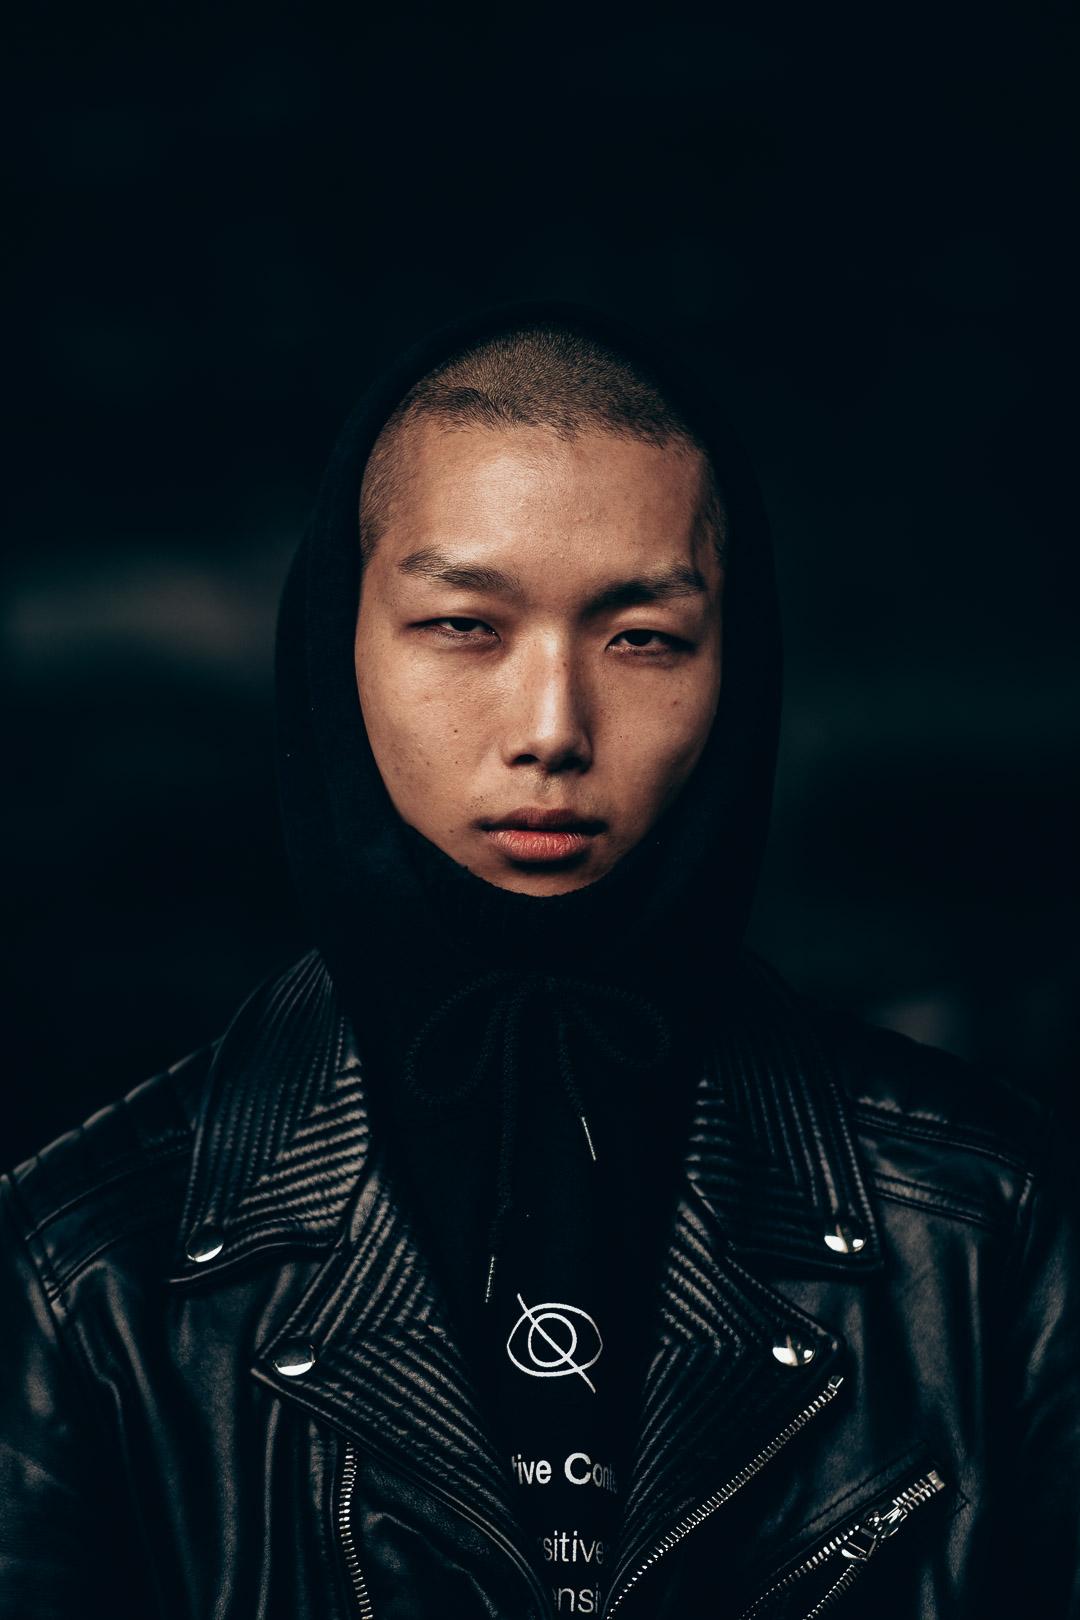 street style portrait photography at Paris Fashion Week